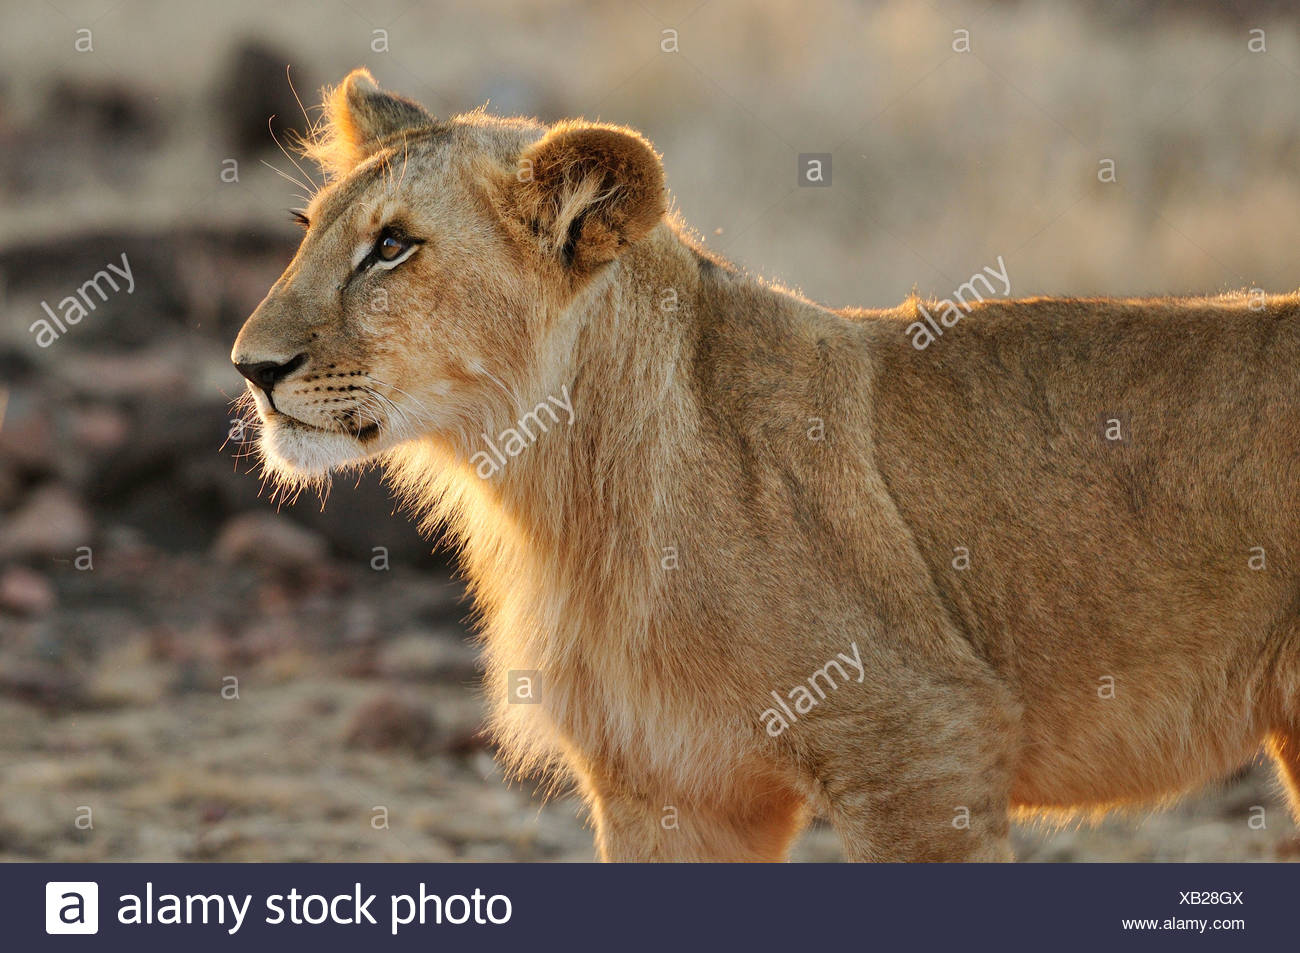 Africa, Zimbabwe Victoria Falls, Lion, leone, animale Immagini Stock